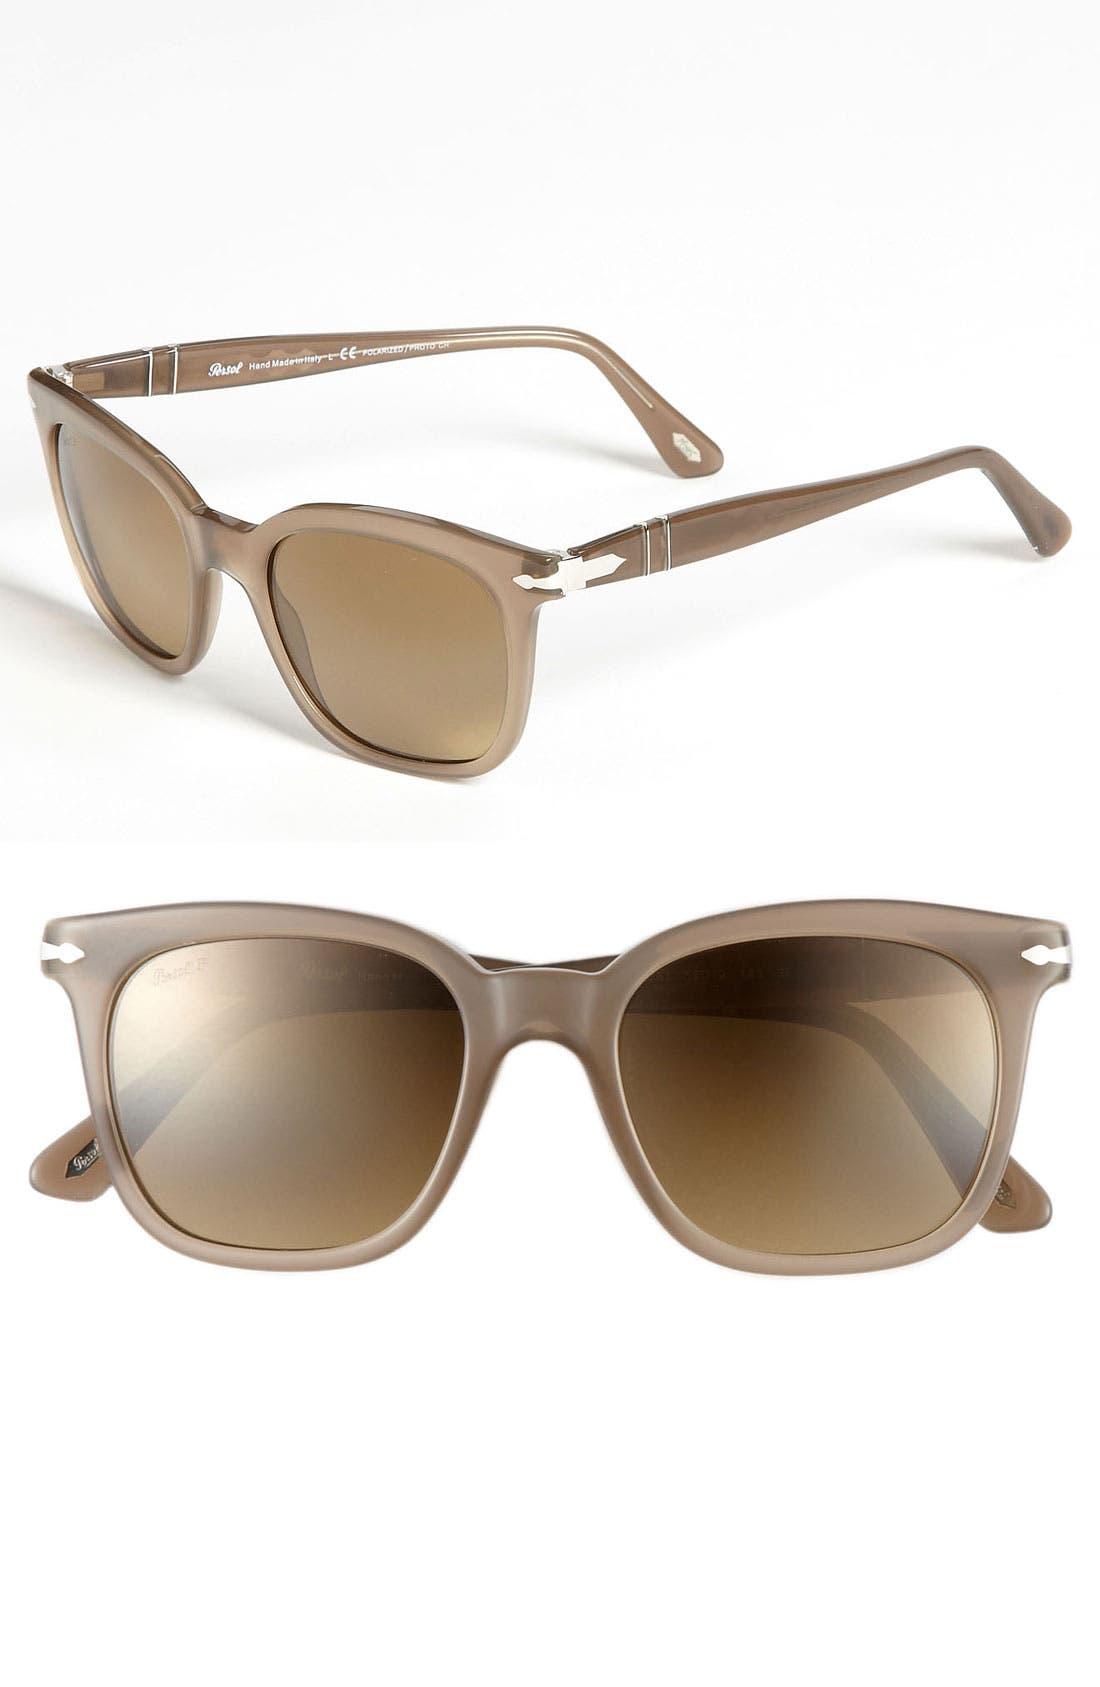 Main Image - Persol 52mm Polarized Sunglasses